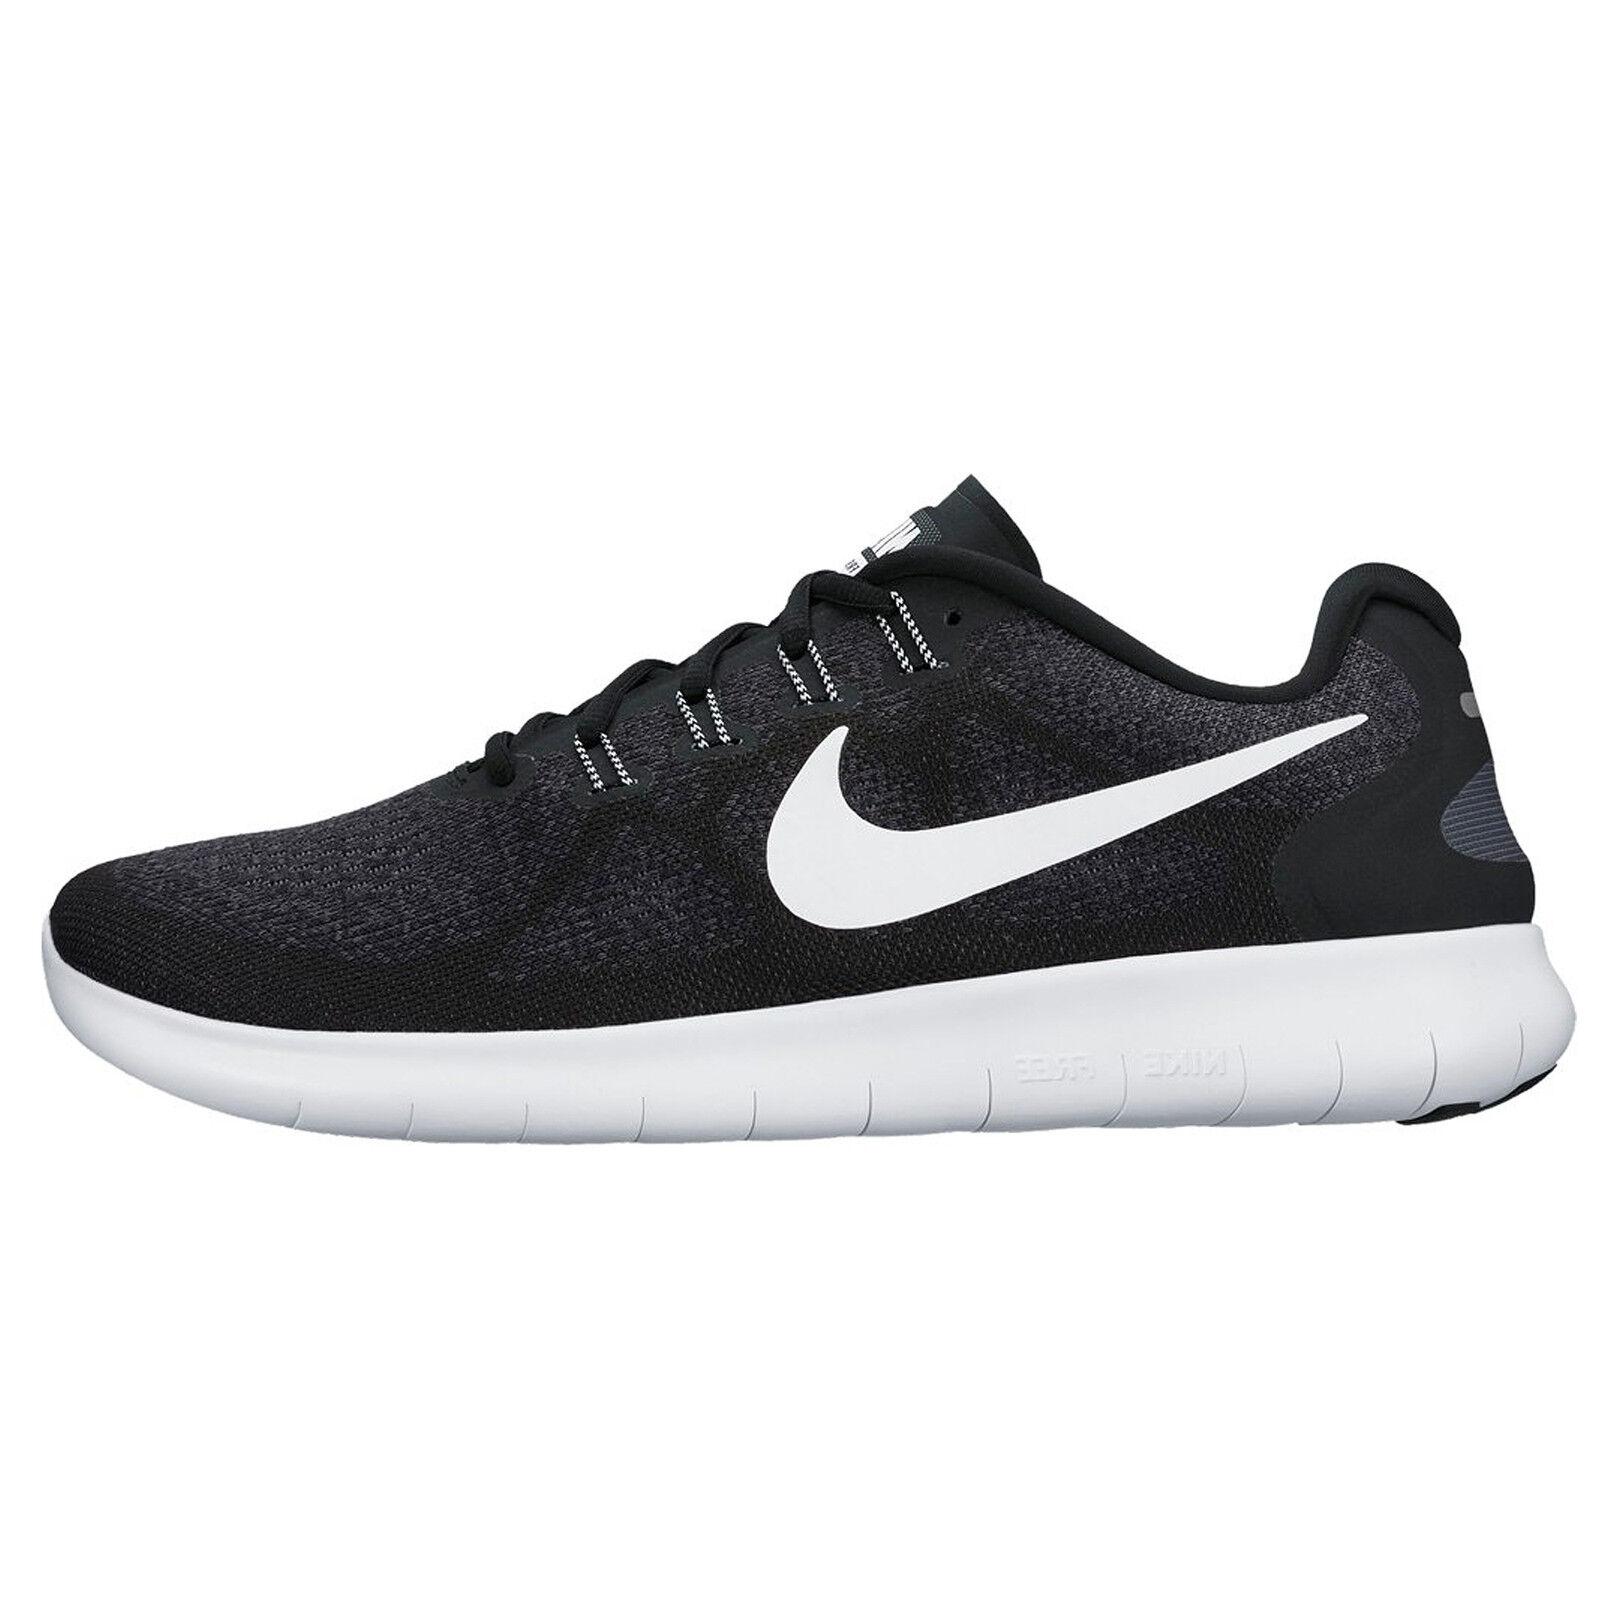 Nike 880839-001 Free RN 2017 880839-001 Nike Lauschuh Sportschuh Sneaker Freizeit afe4e6